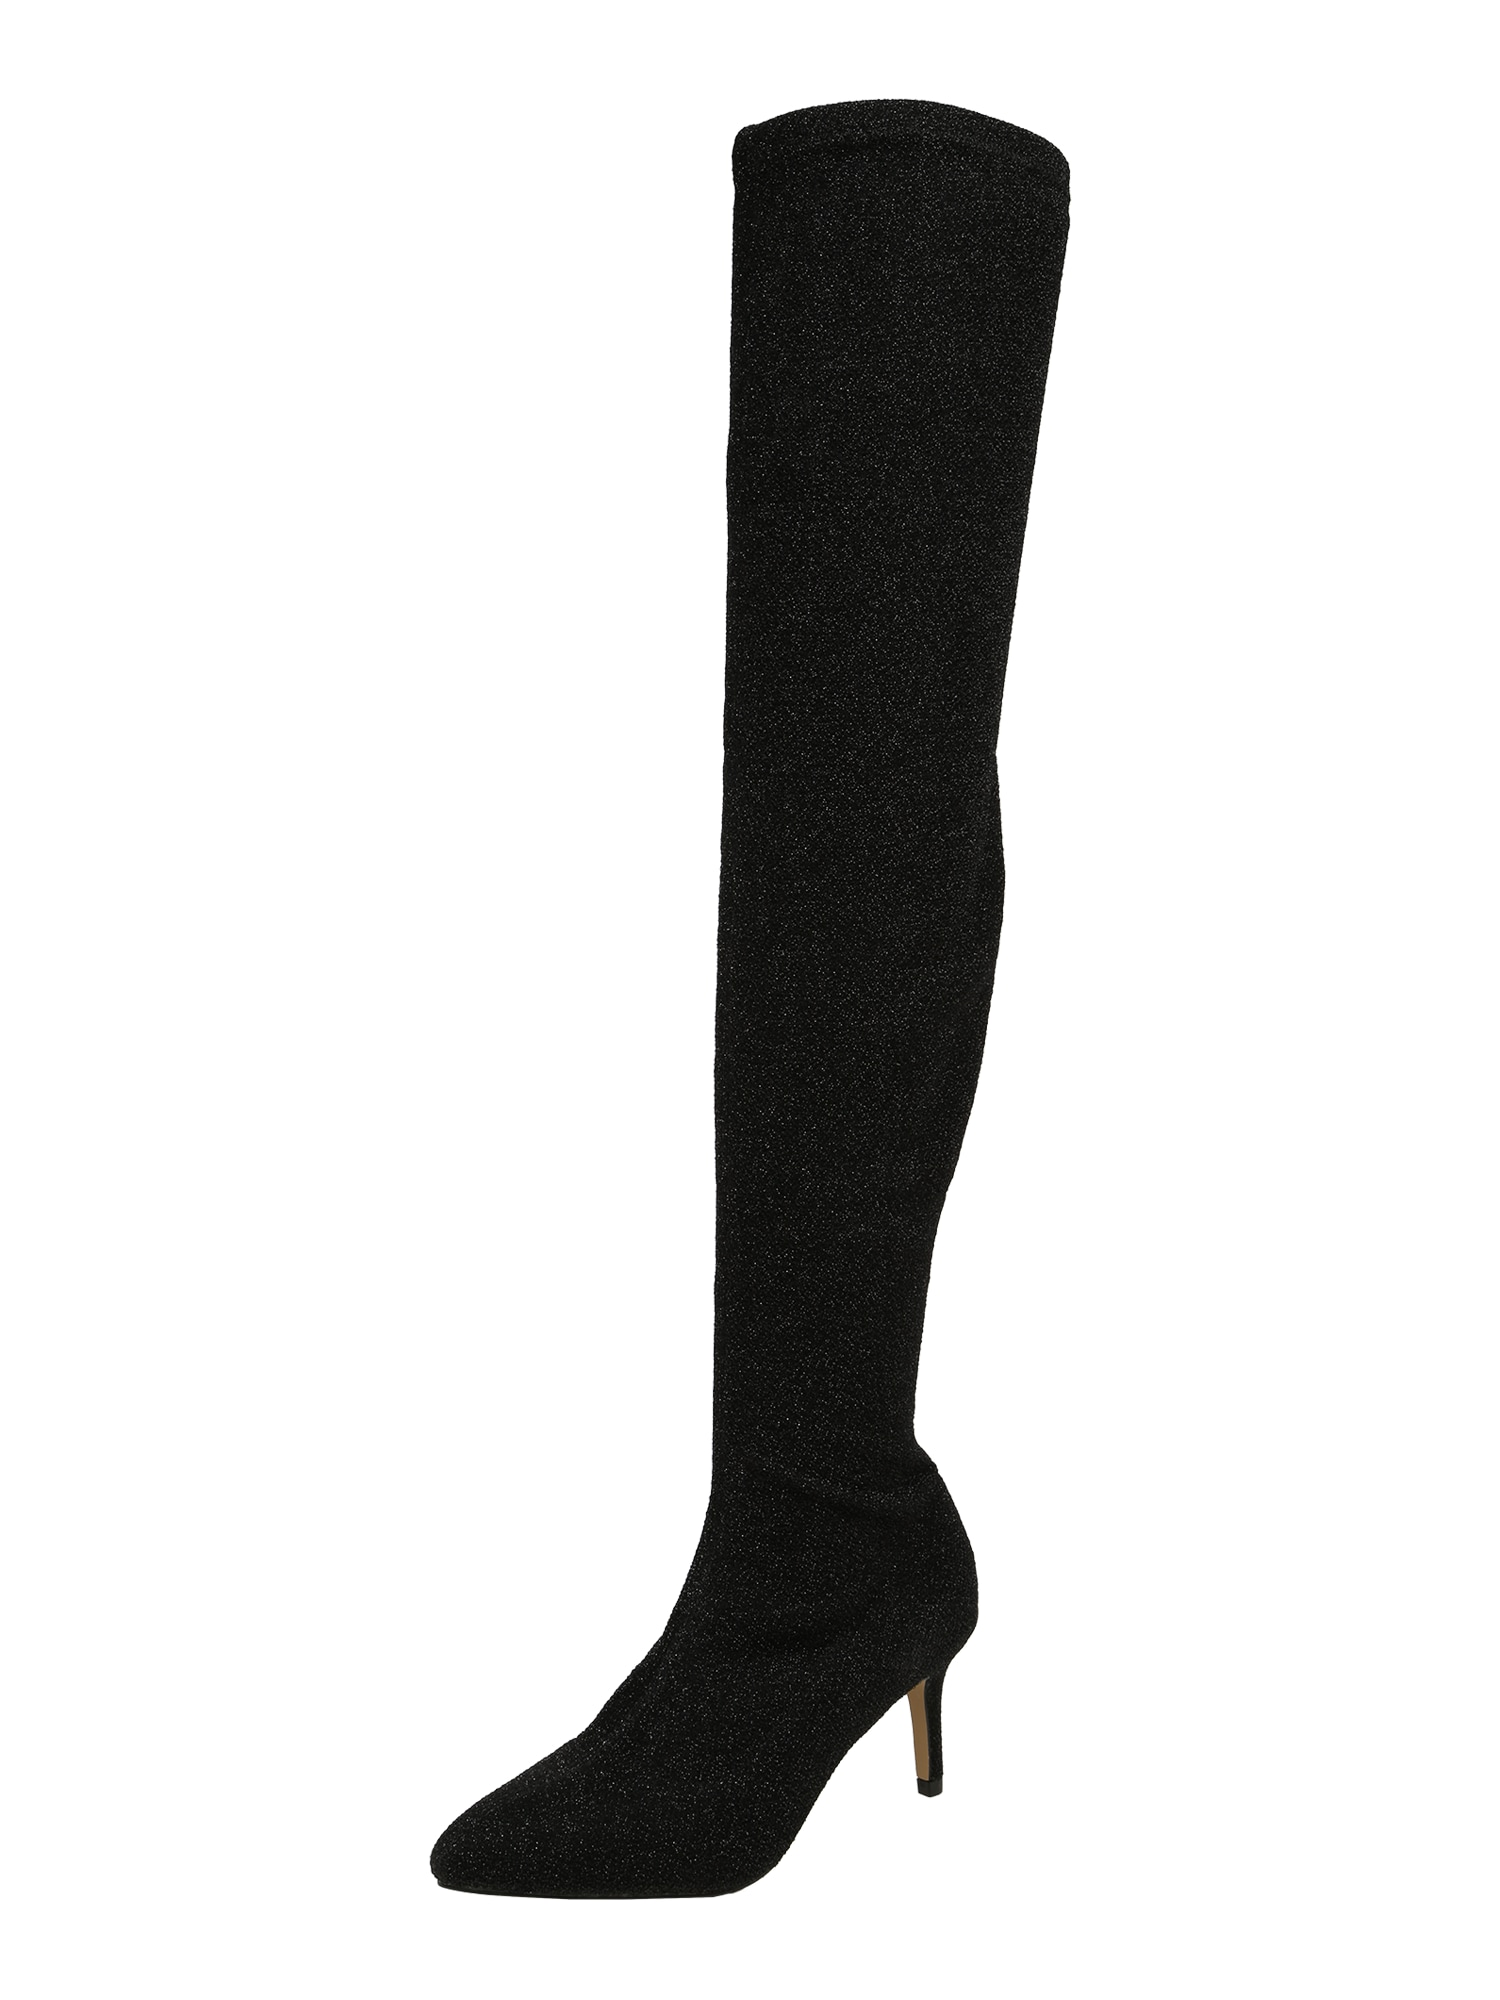 4ea2bd3d6bd3da Overknee-Stiefel cool bis elegant bei COUTURISTA